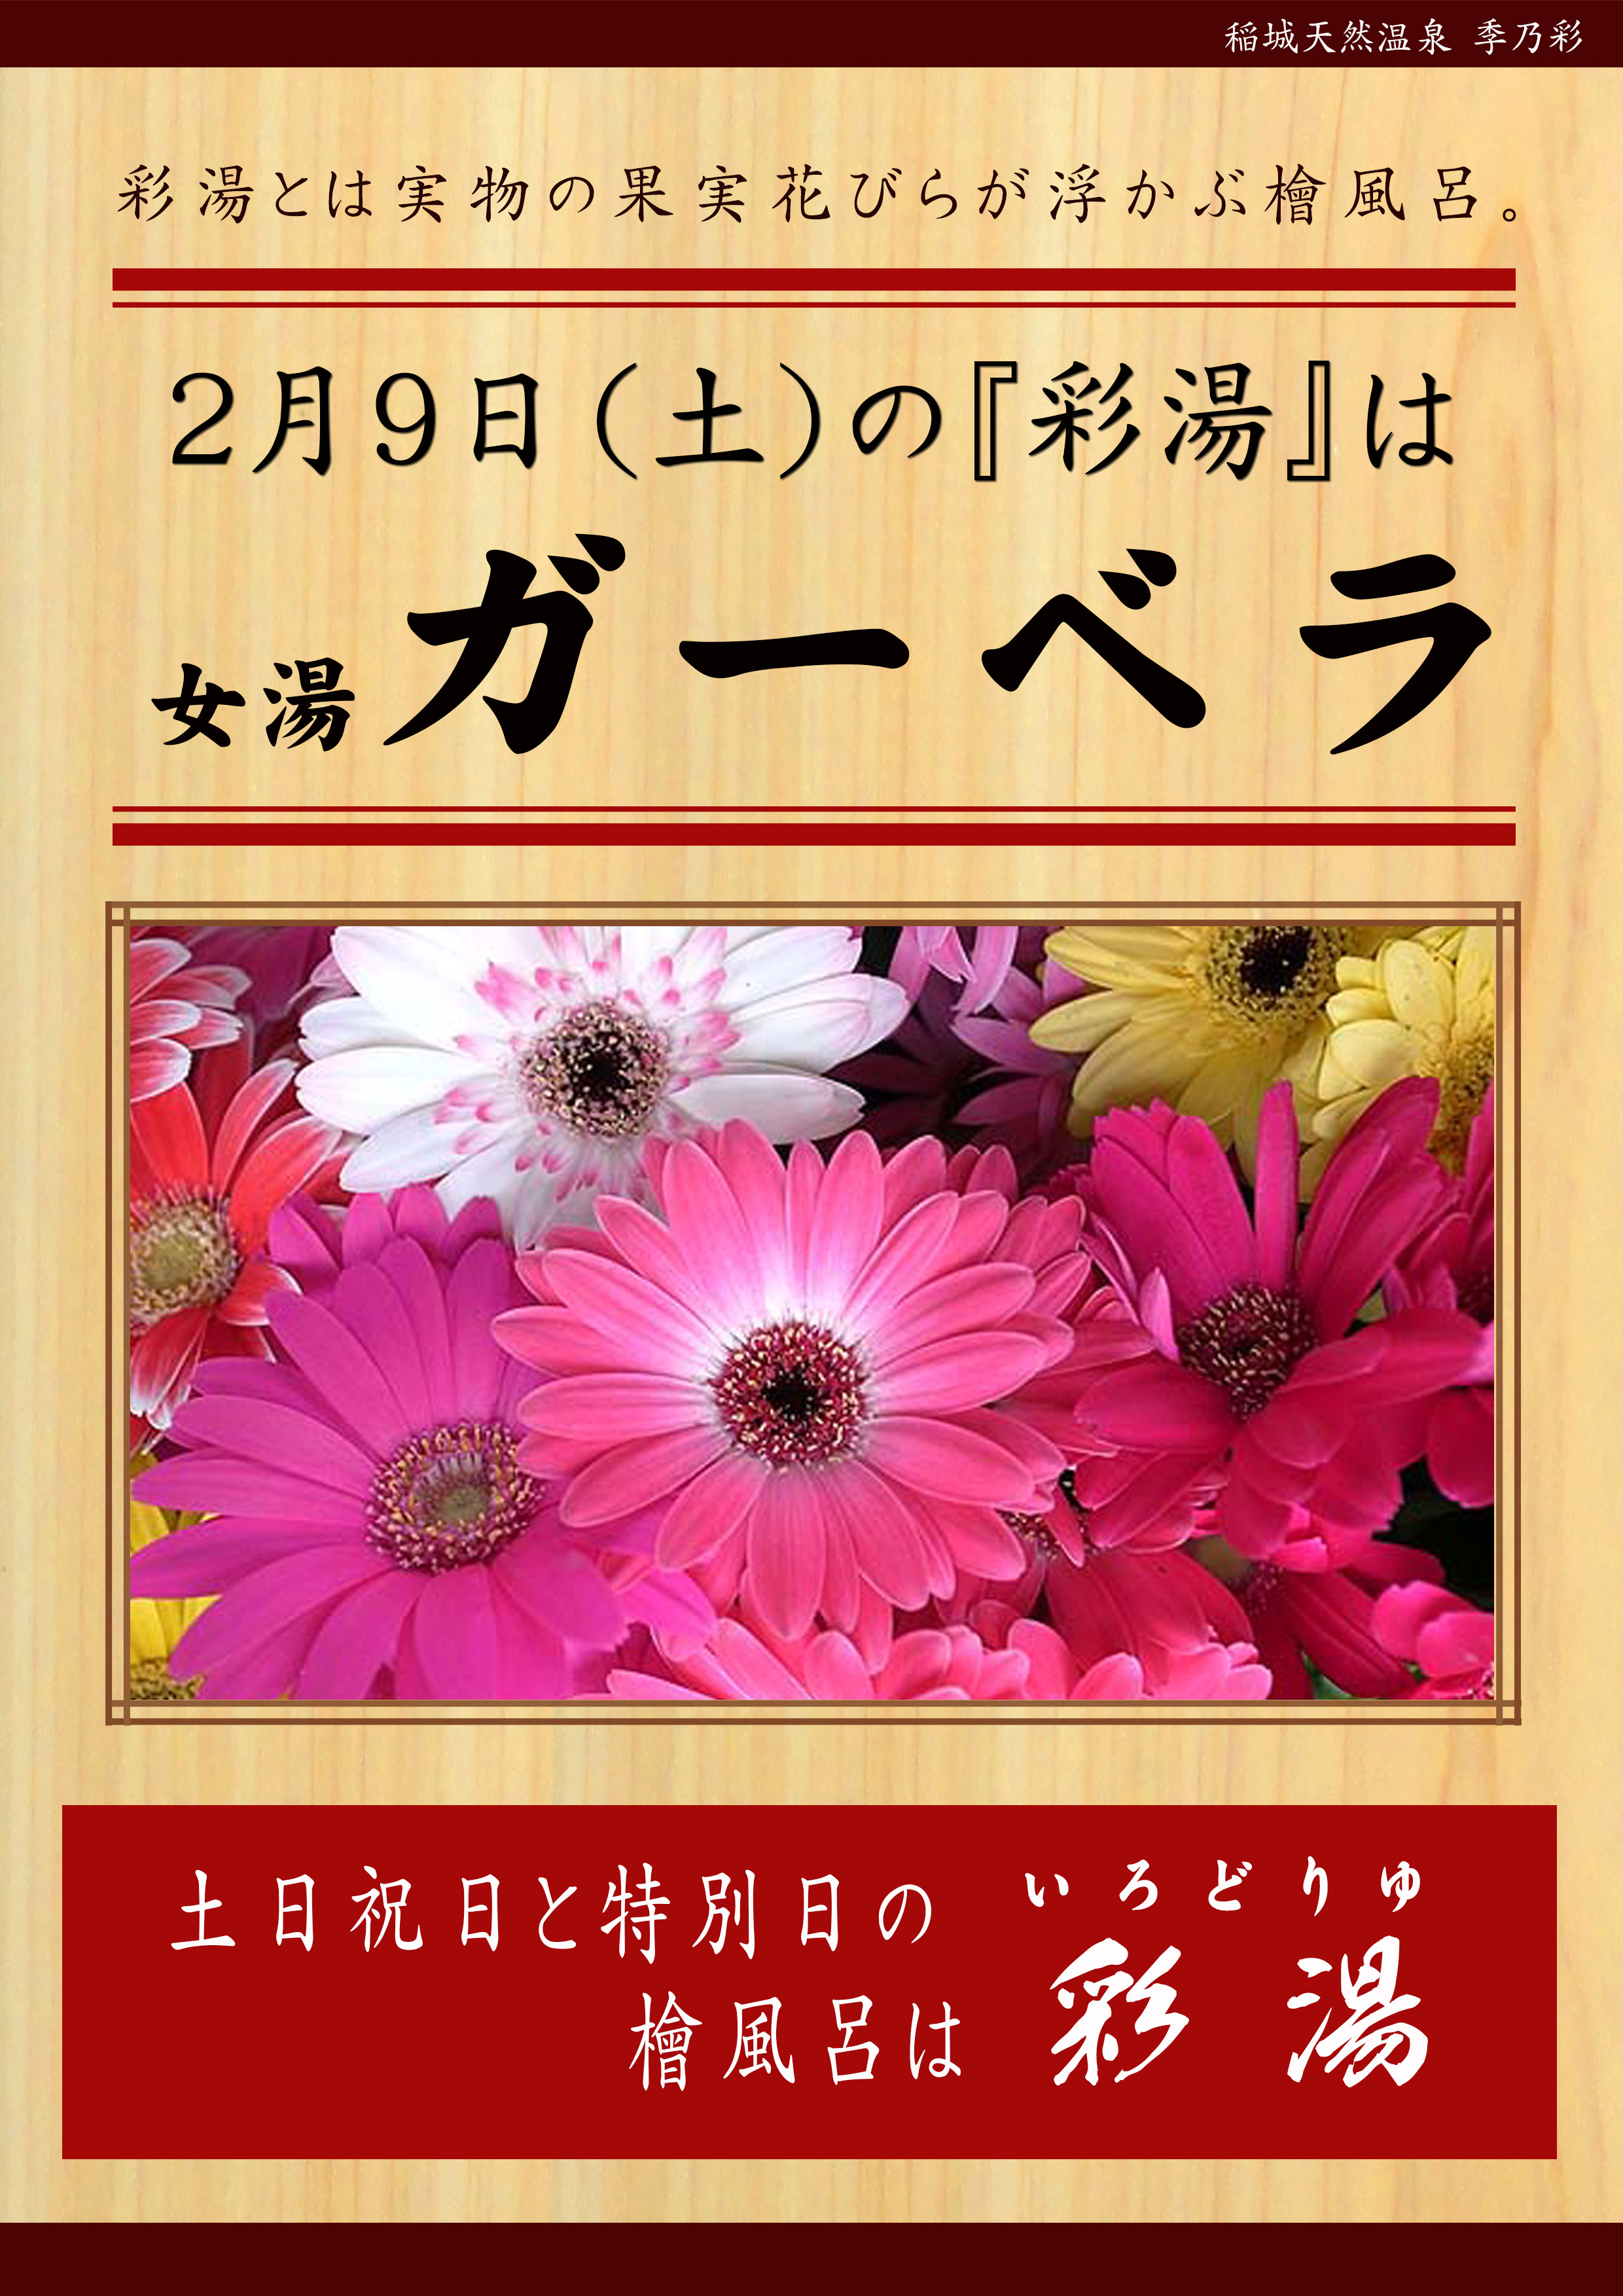 20190209 POP イベント 彩湯 女湯 ガーベラ